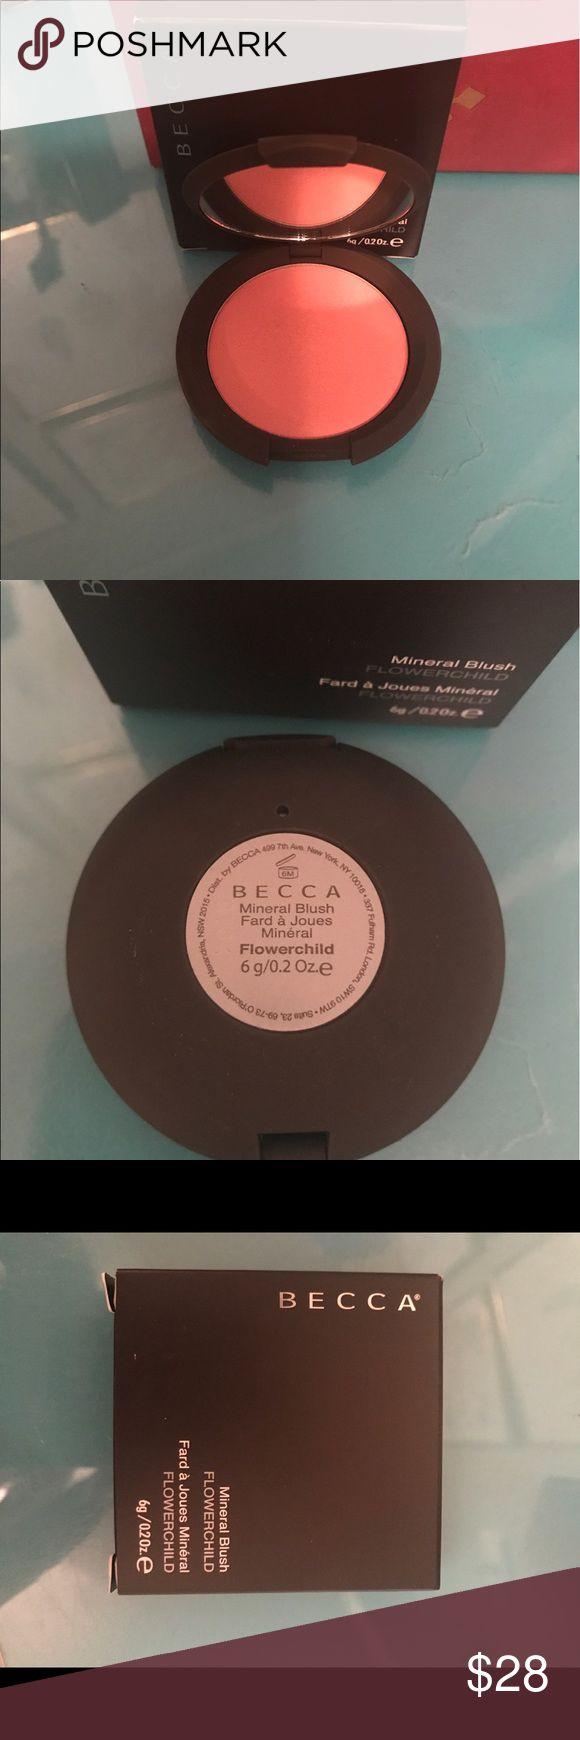 Becca flowerchild mineral blush Becca flowerchild mineral blush. Only used once to swatch. BECCA Makeup Blush